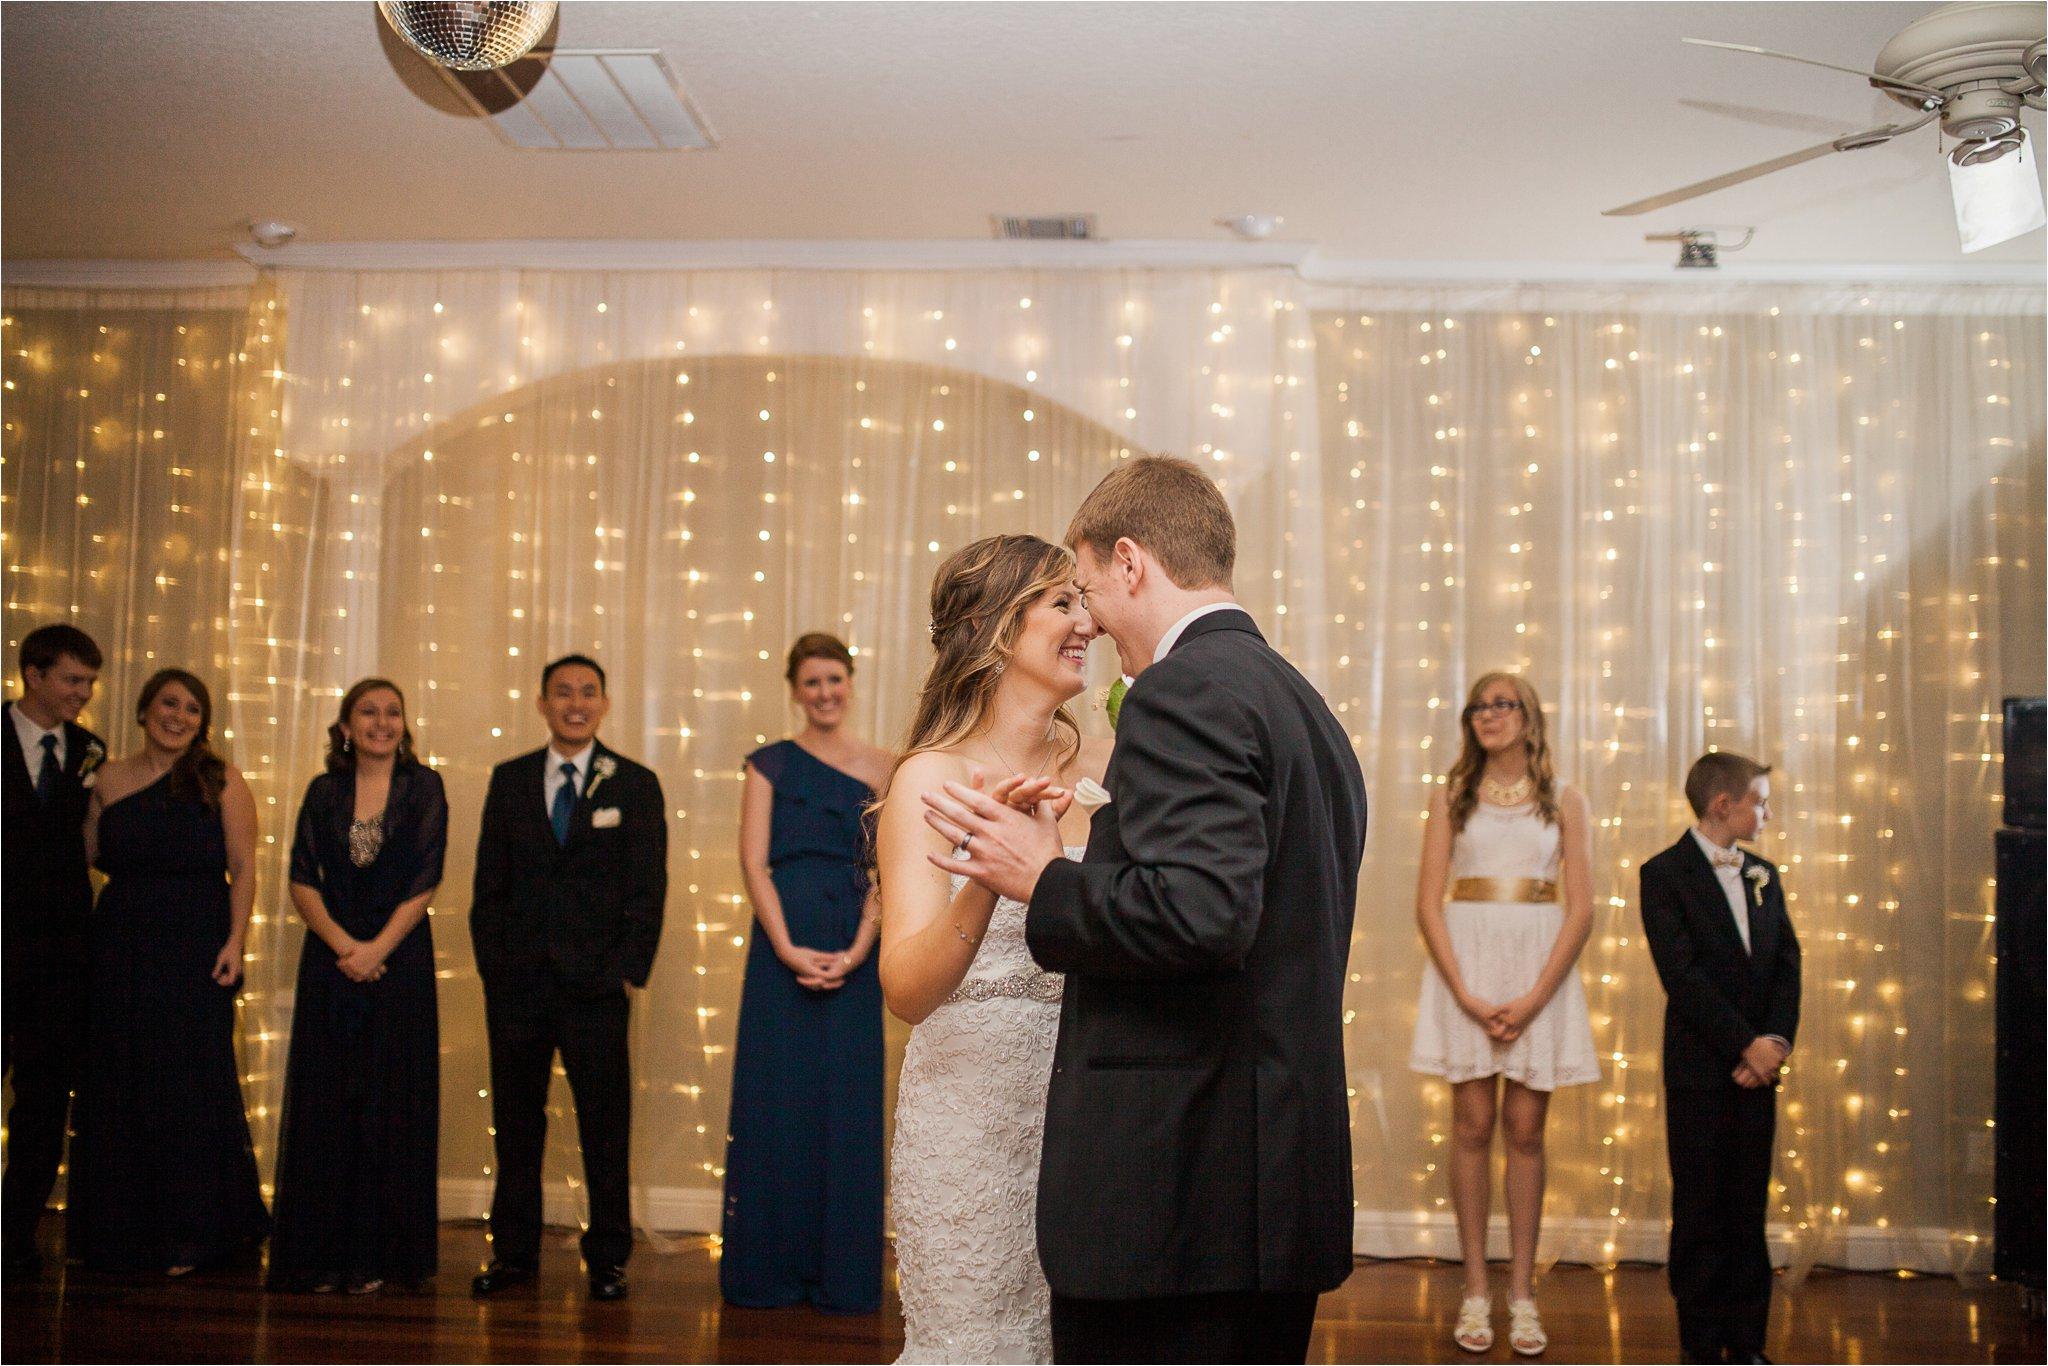 lunsford-wedding-799.jpg